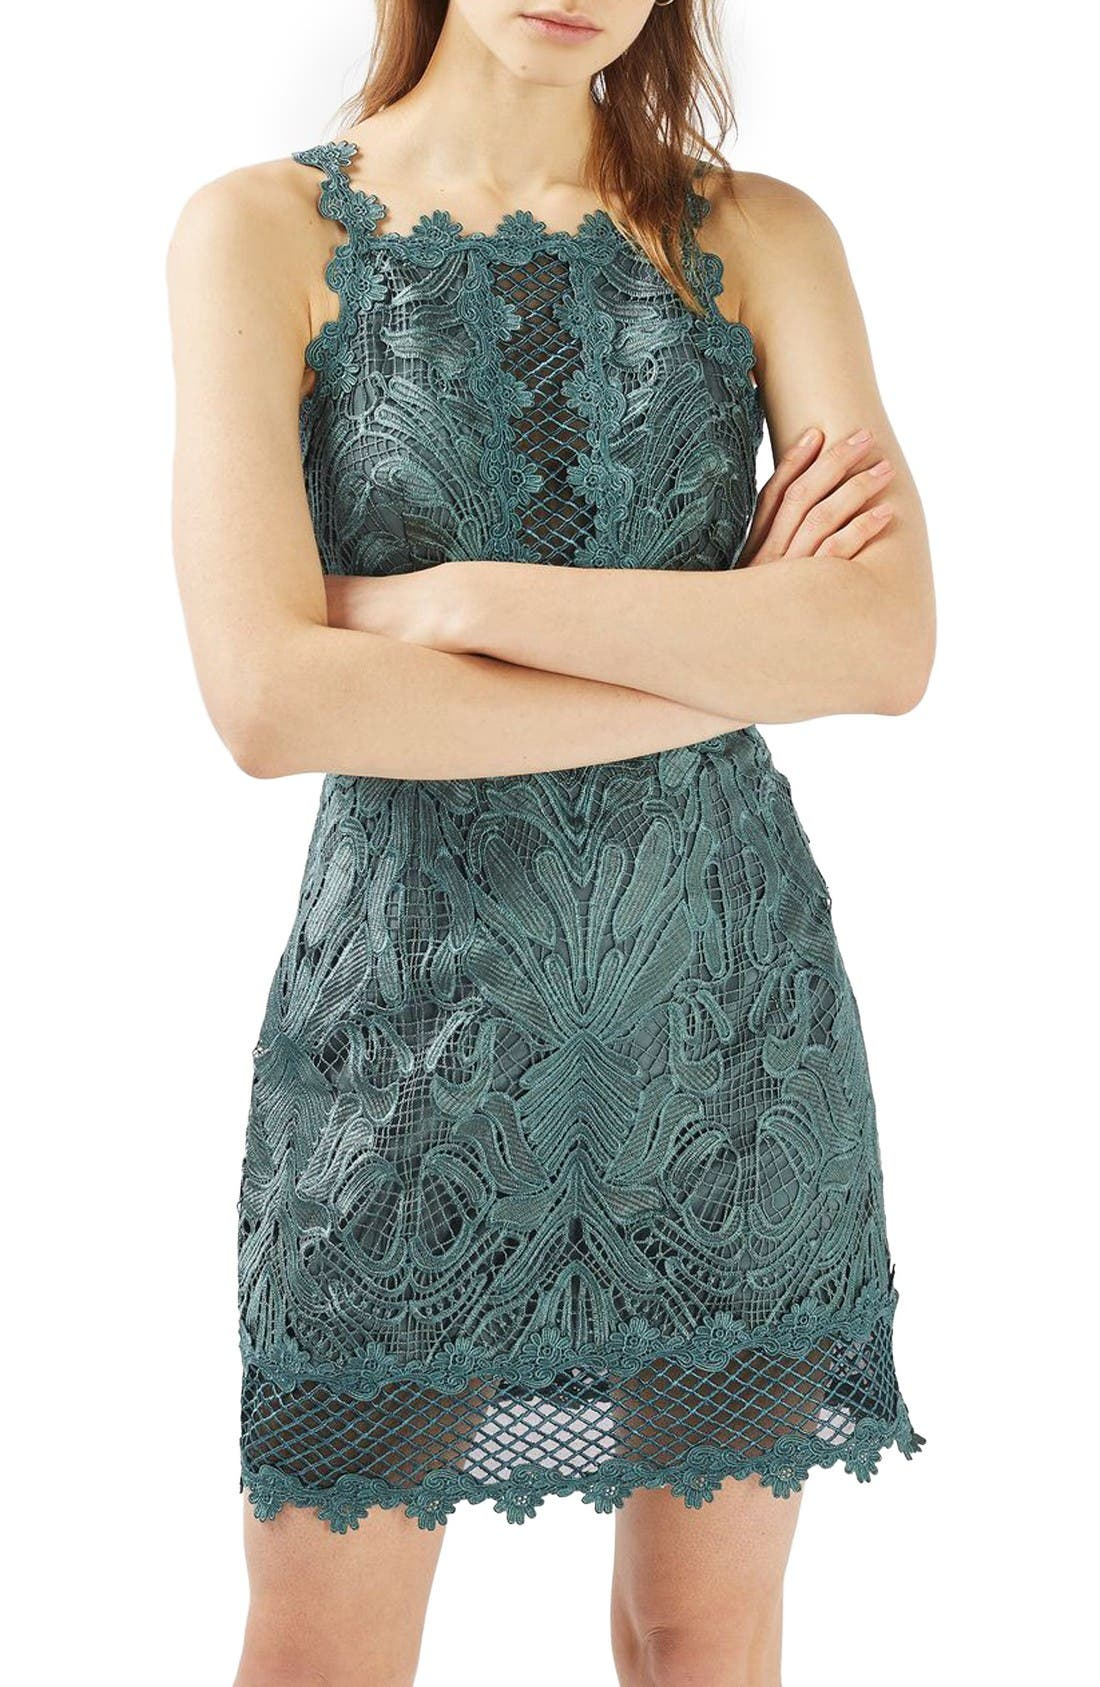 Topshop Lace Detail Sleeveless A-Line Dress (Regular & Petite)